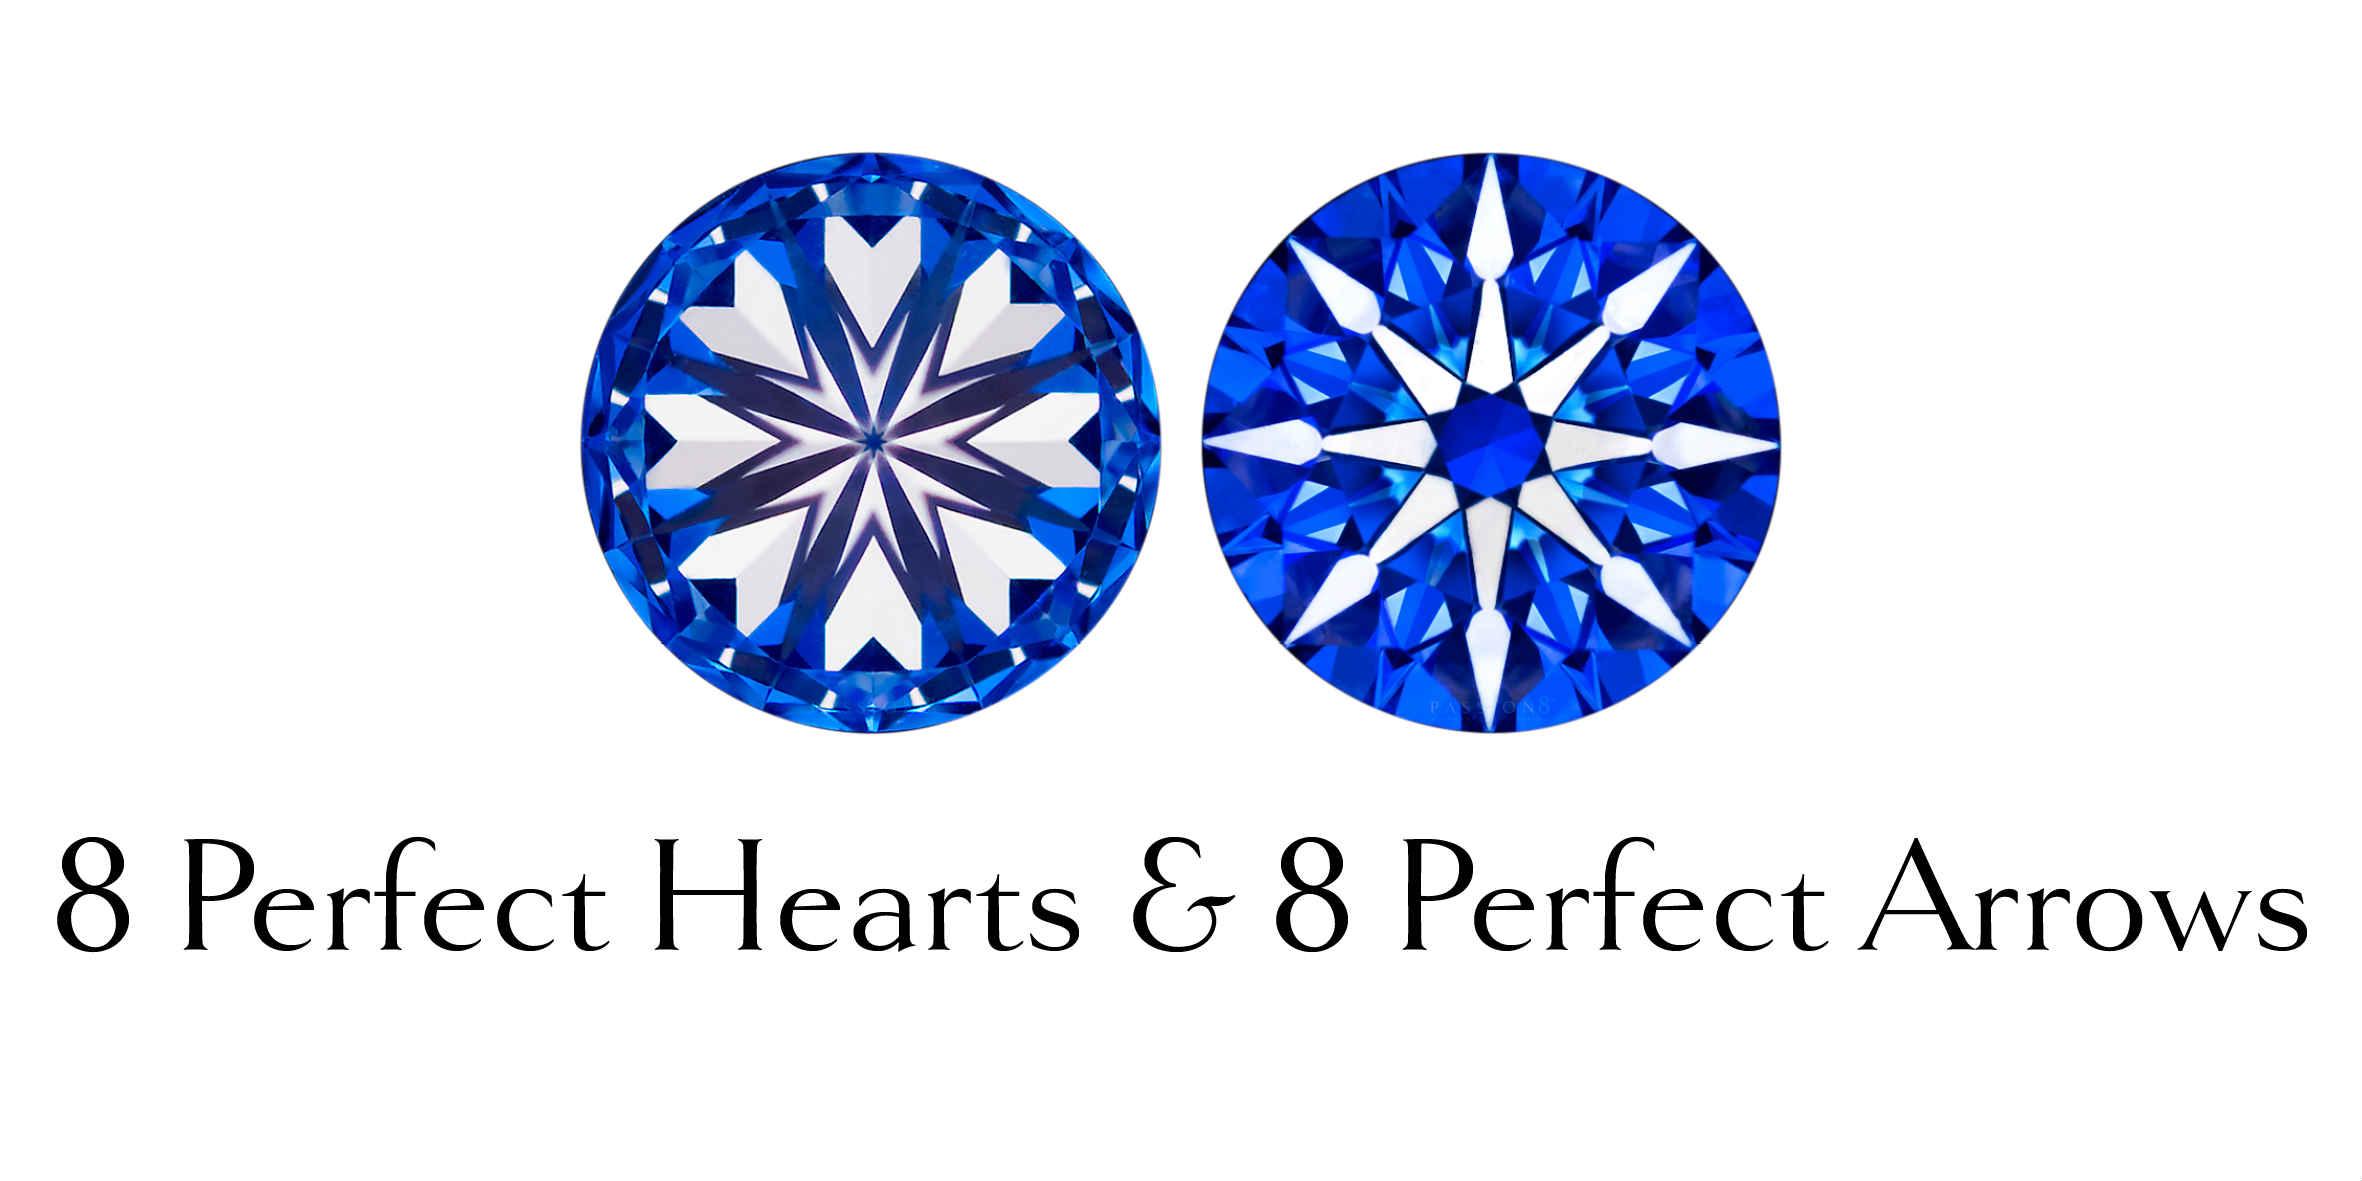 8 Perfect Hearts & 8 Perfecet Arrows